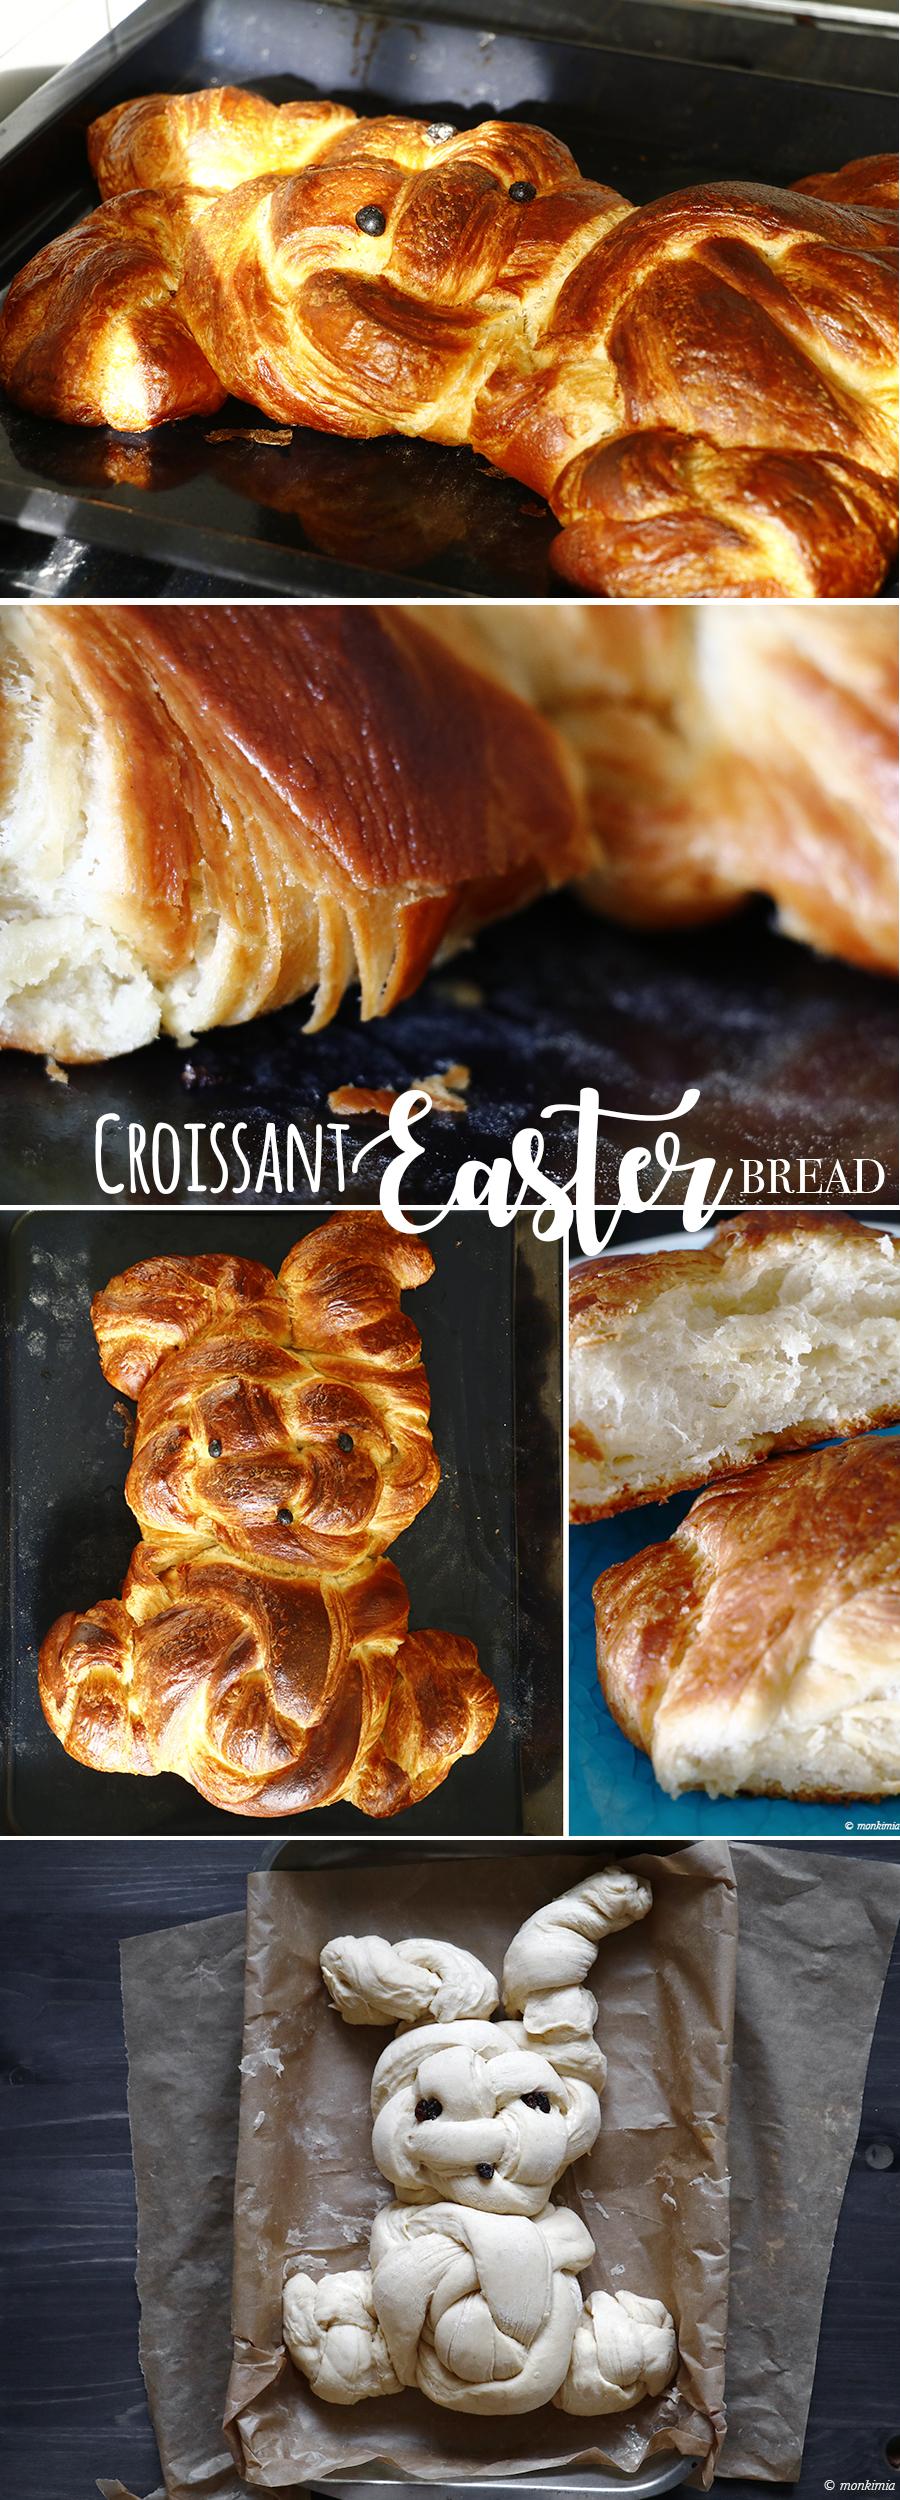 Croissant easter bread recipe